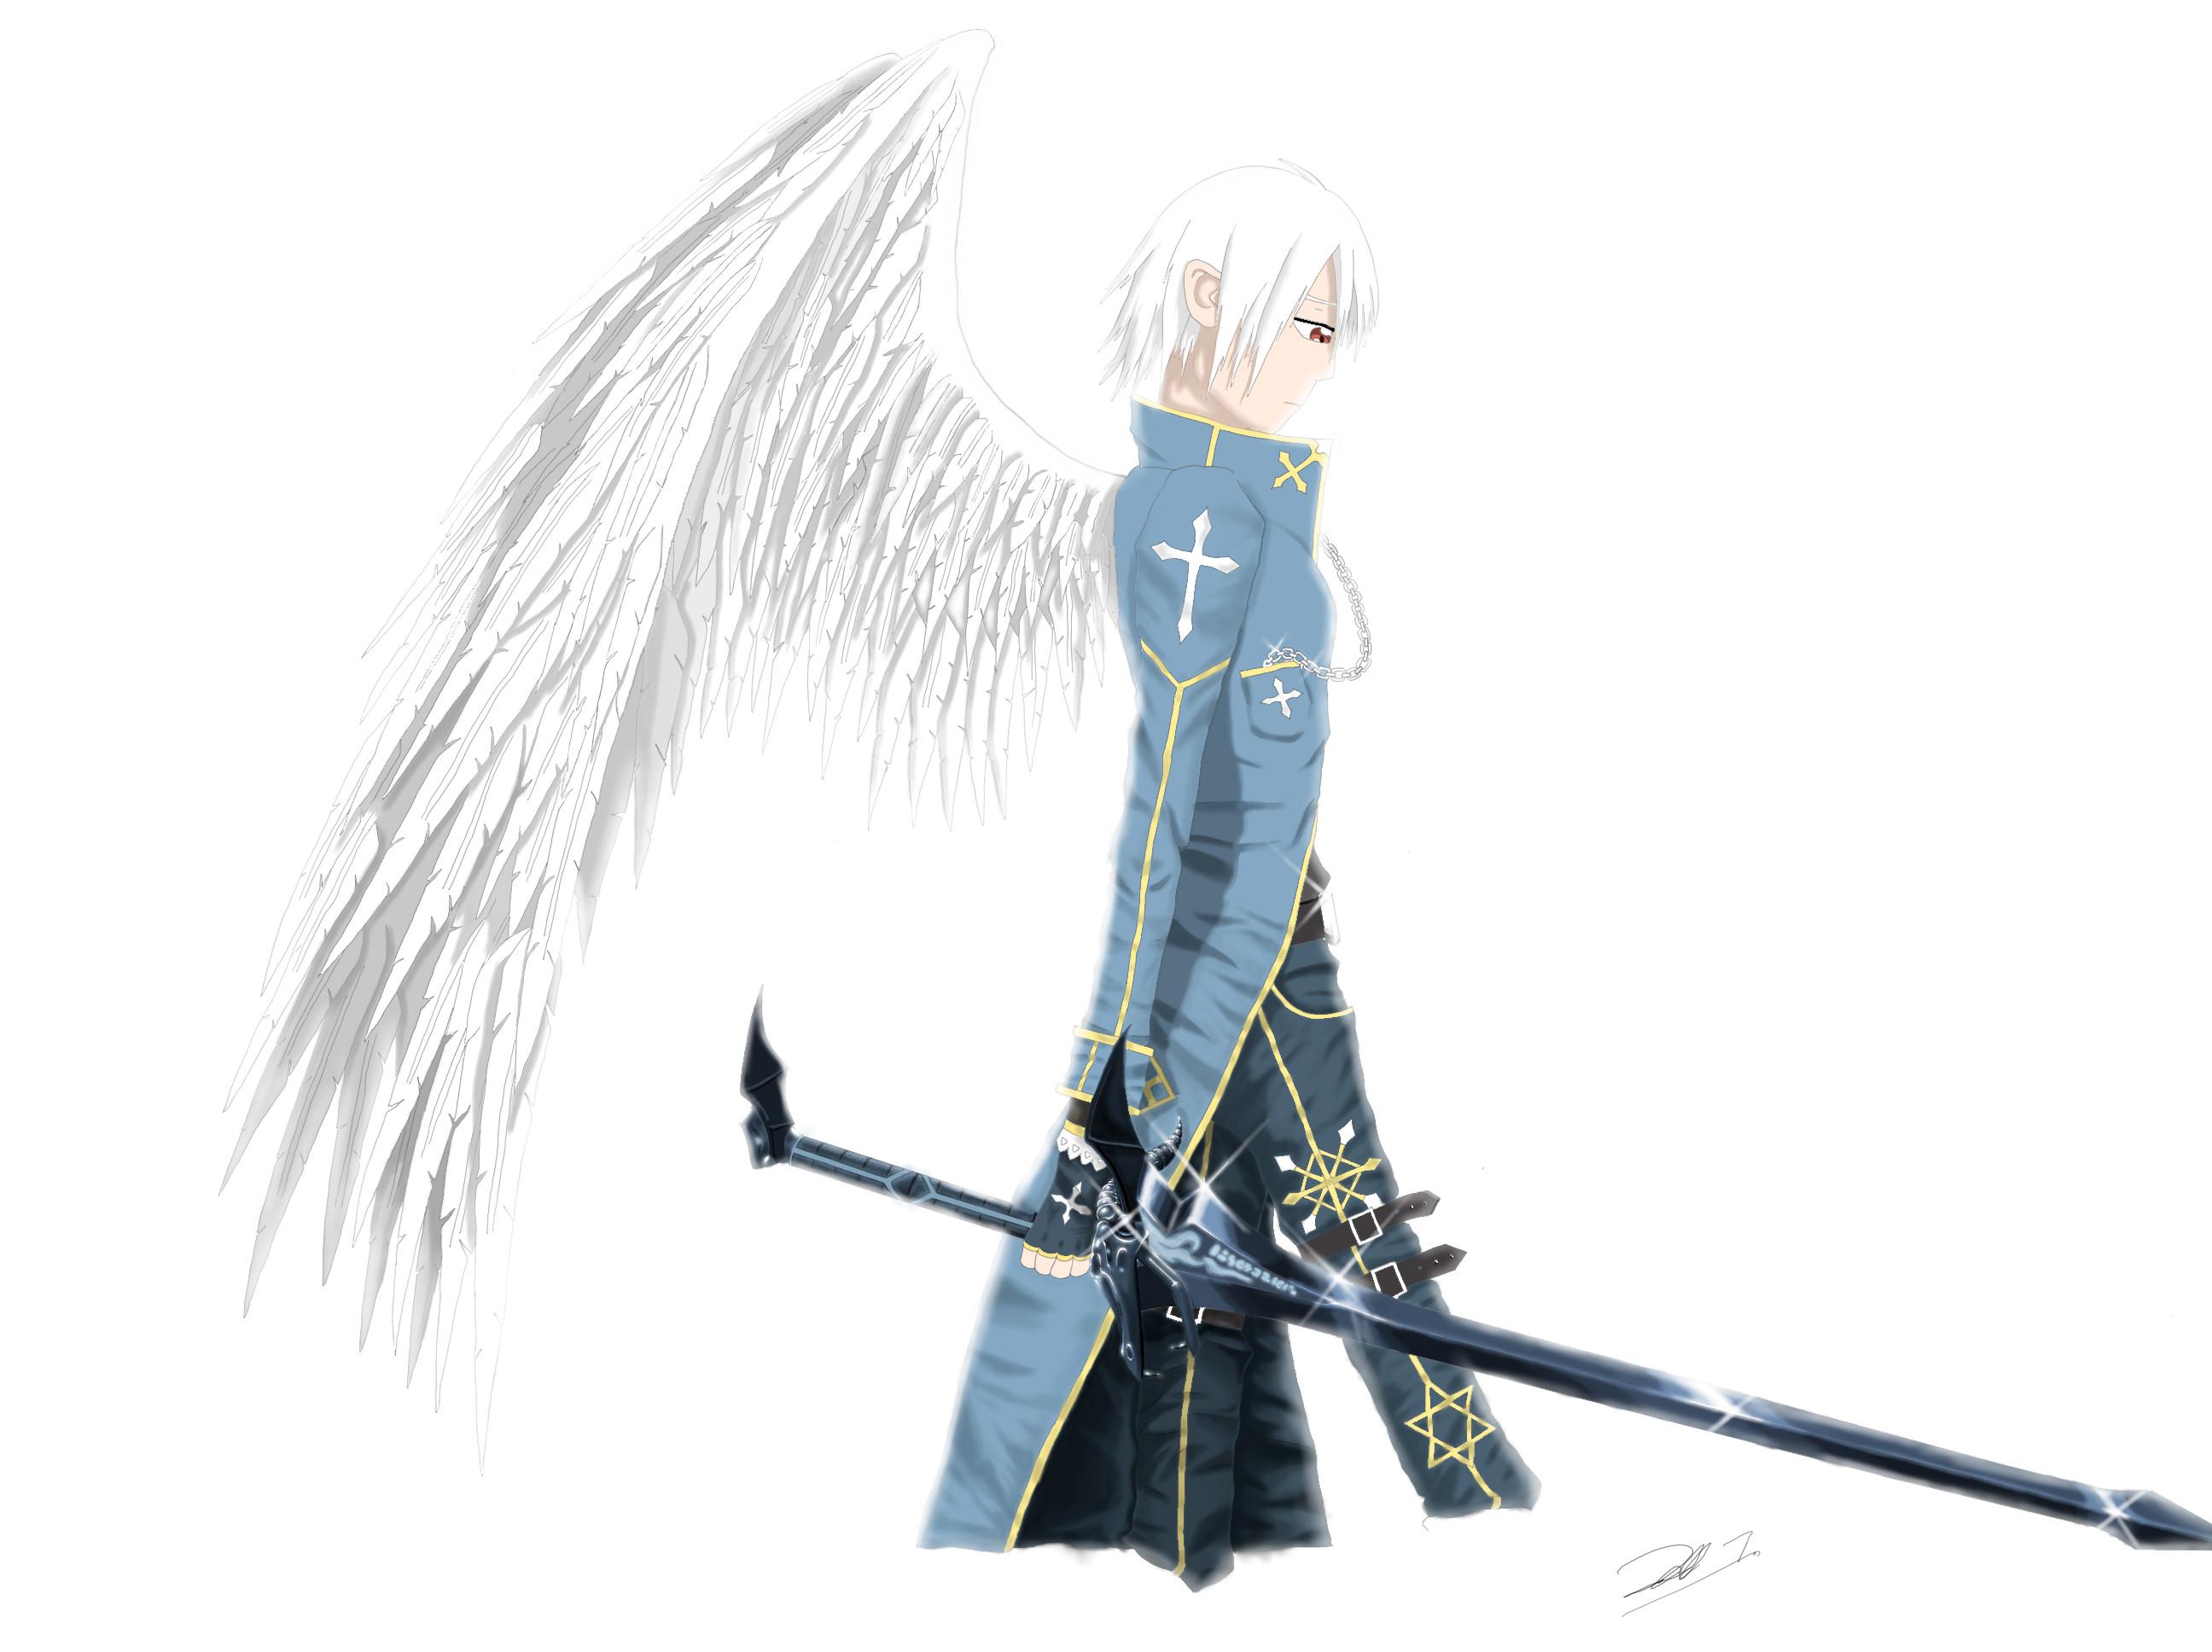 Drawn angel sword drawing #3